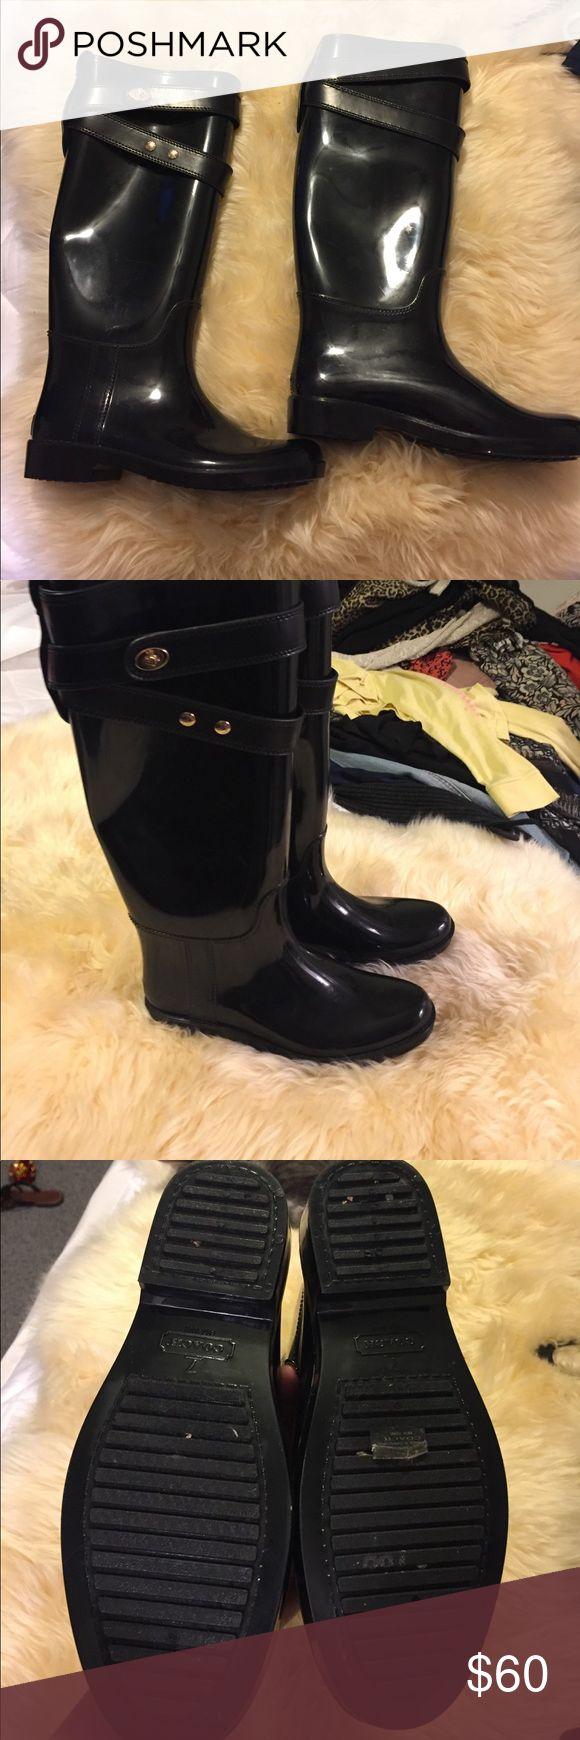 Coach rain boots Brand new Rain boots. Coach Shoes Winter & Rain Boots